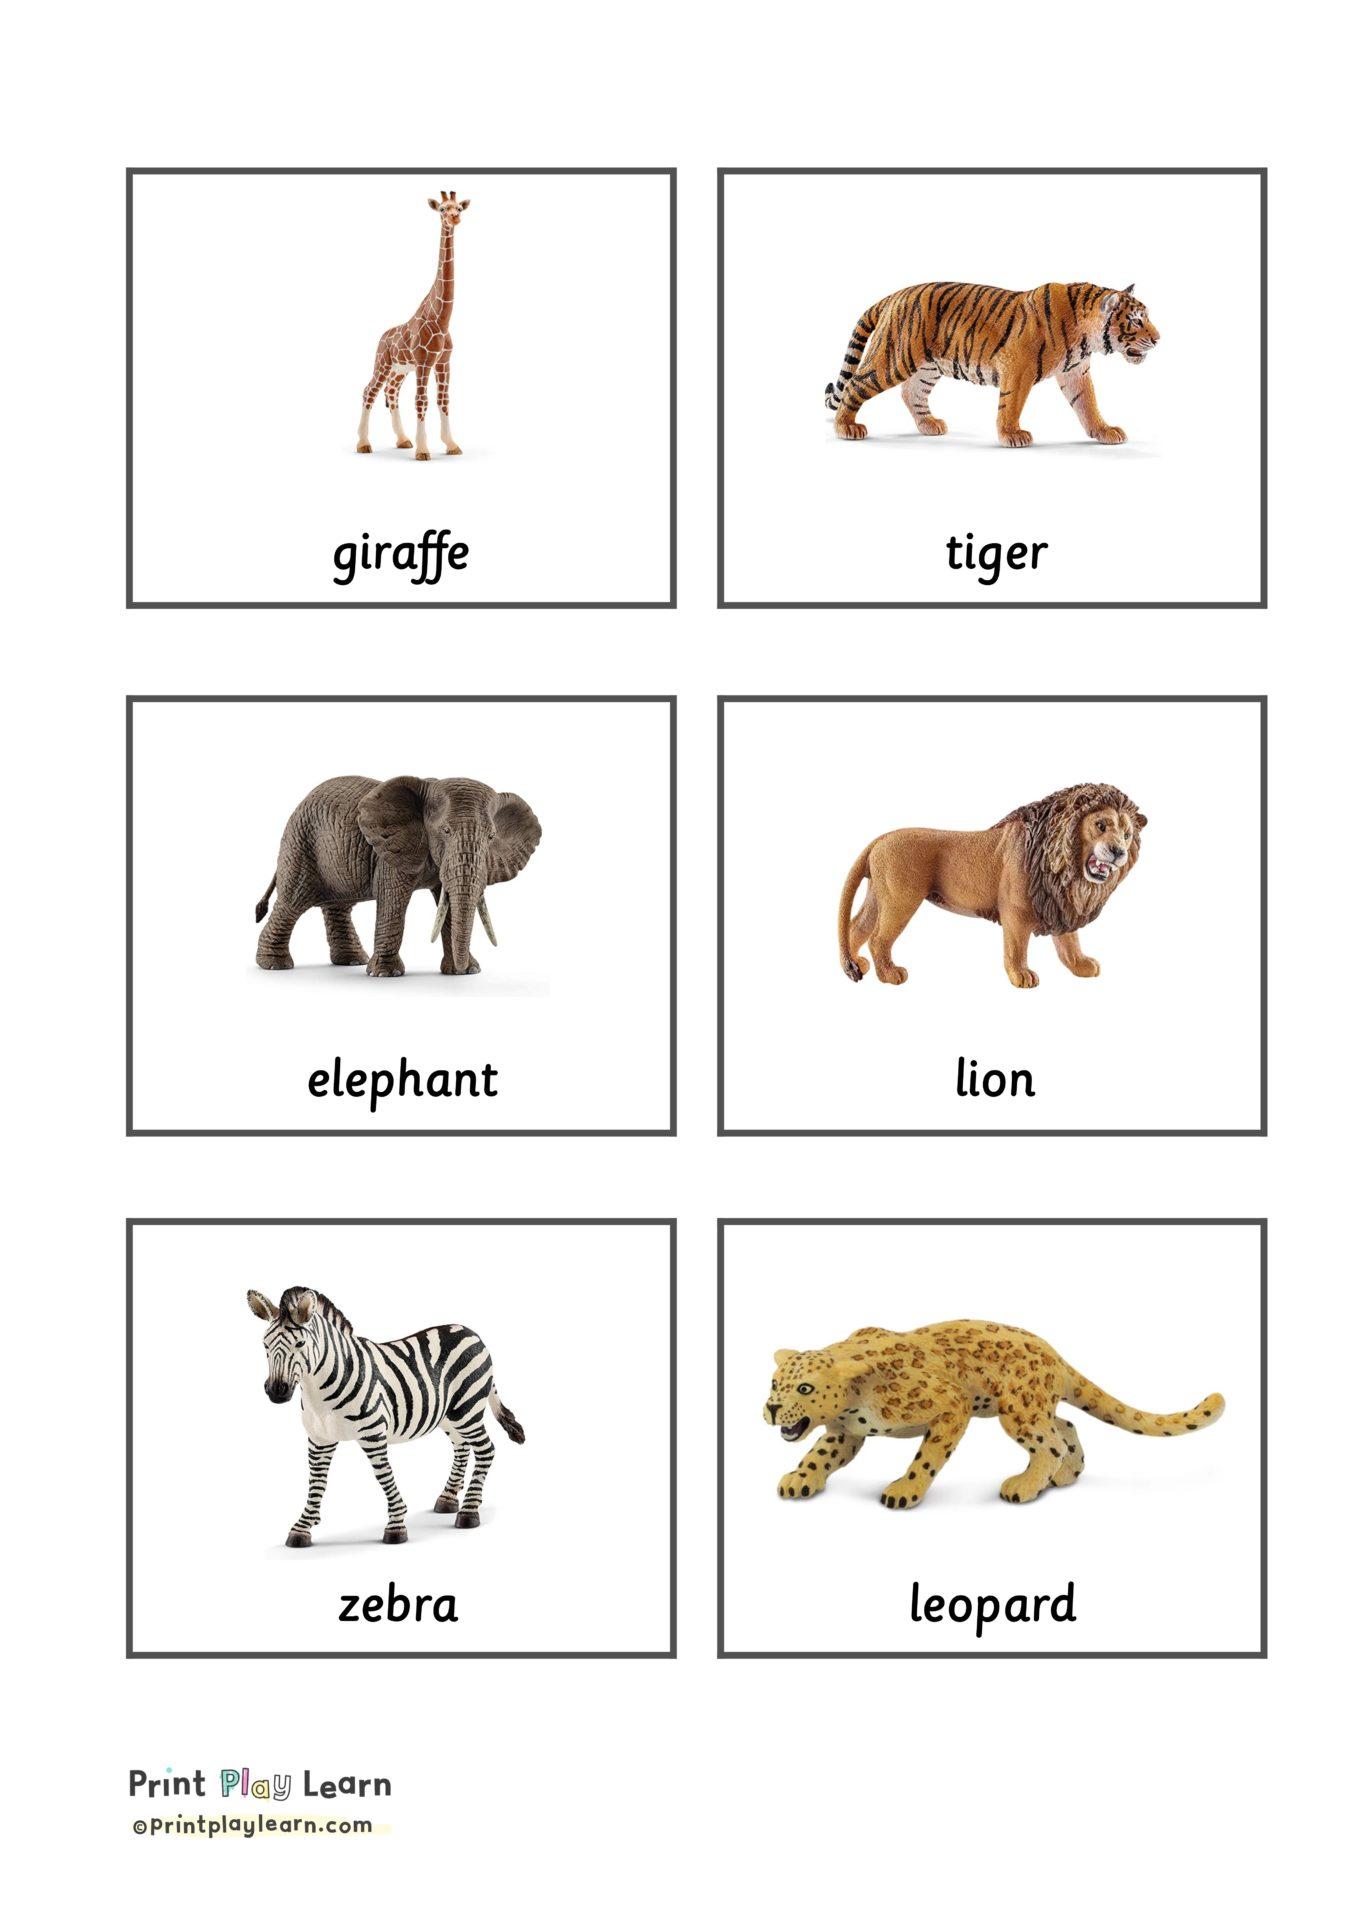 Jungle Animal Classification Cards